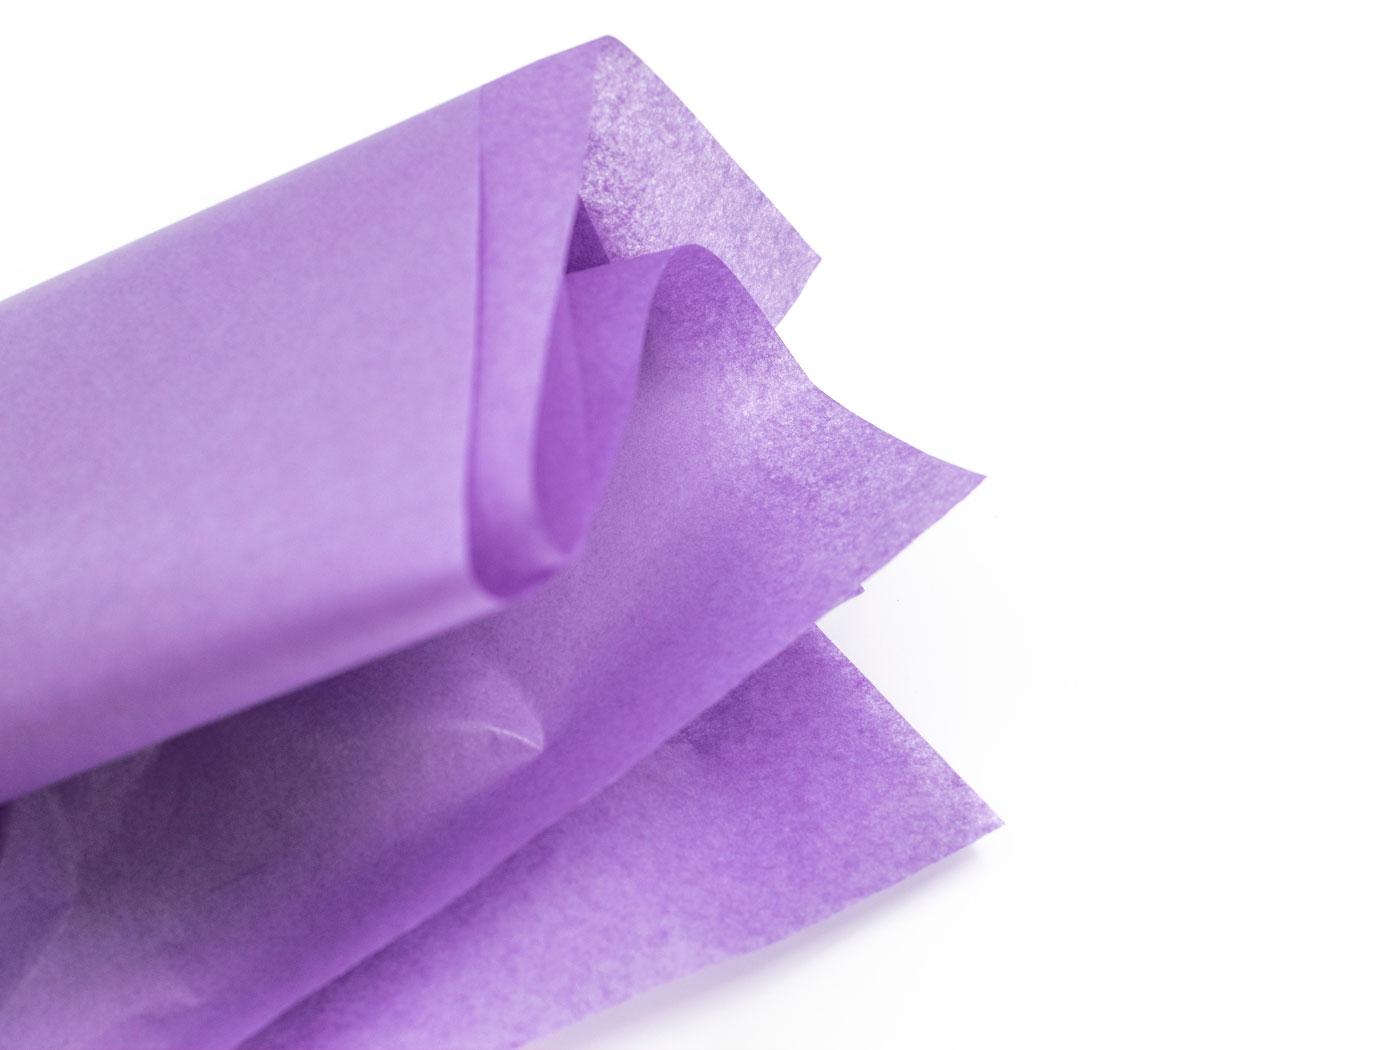 Silkespapper gör det lite lyxigare - Lila - Papper & annat